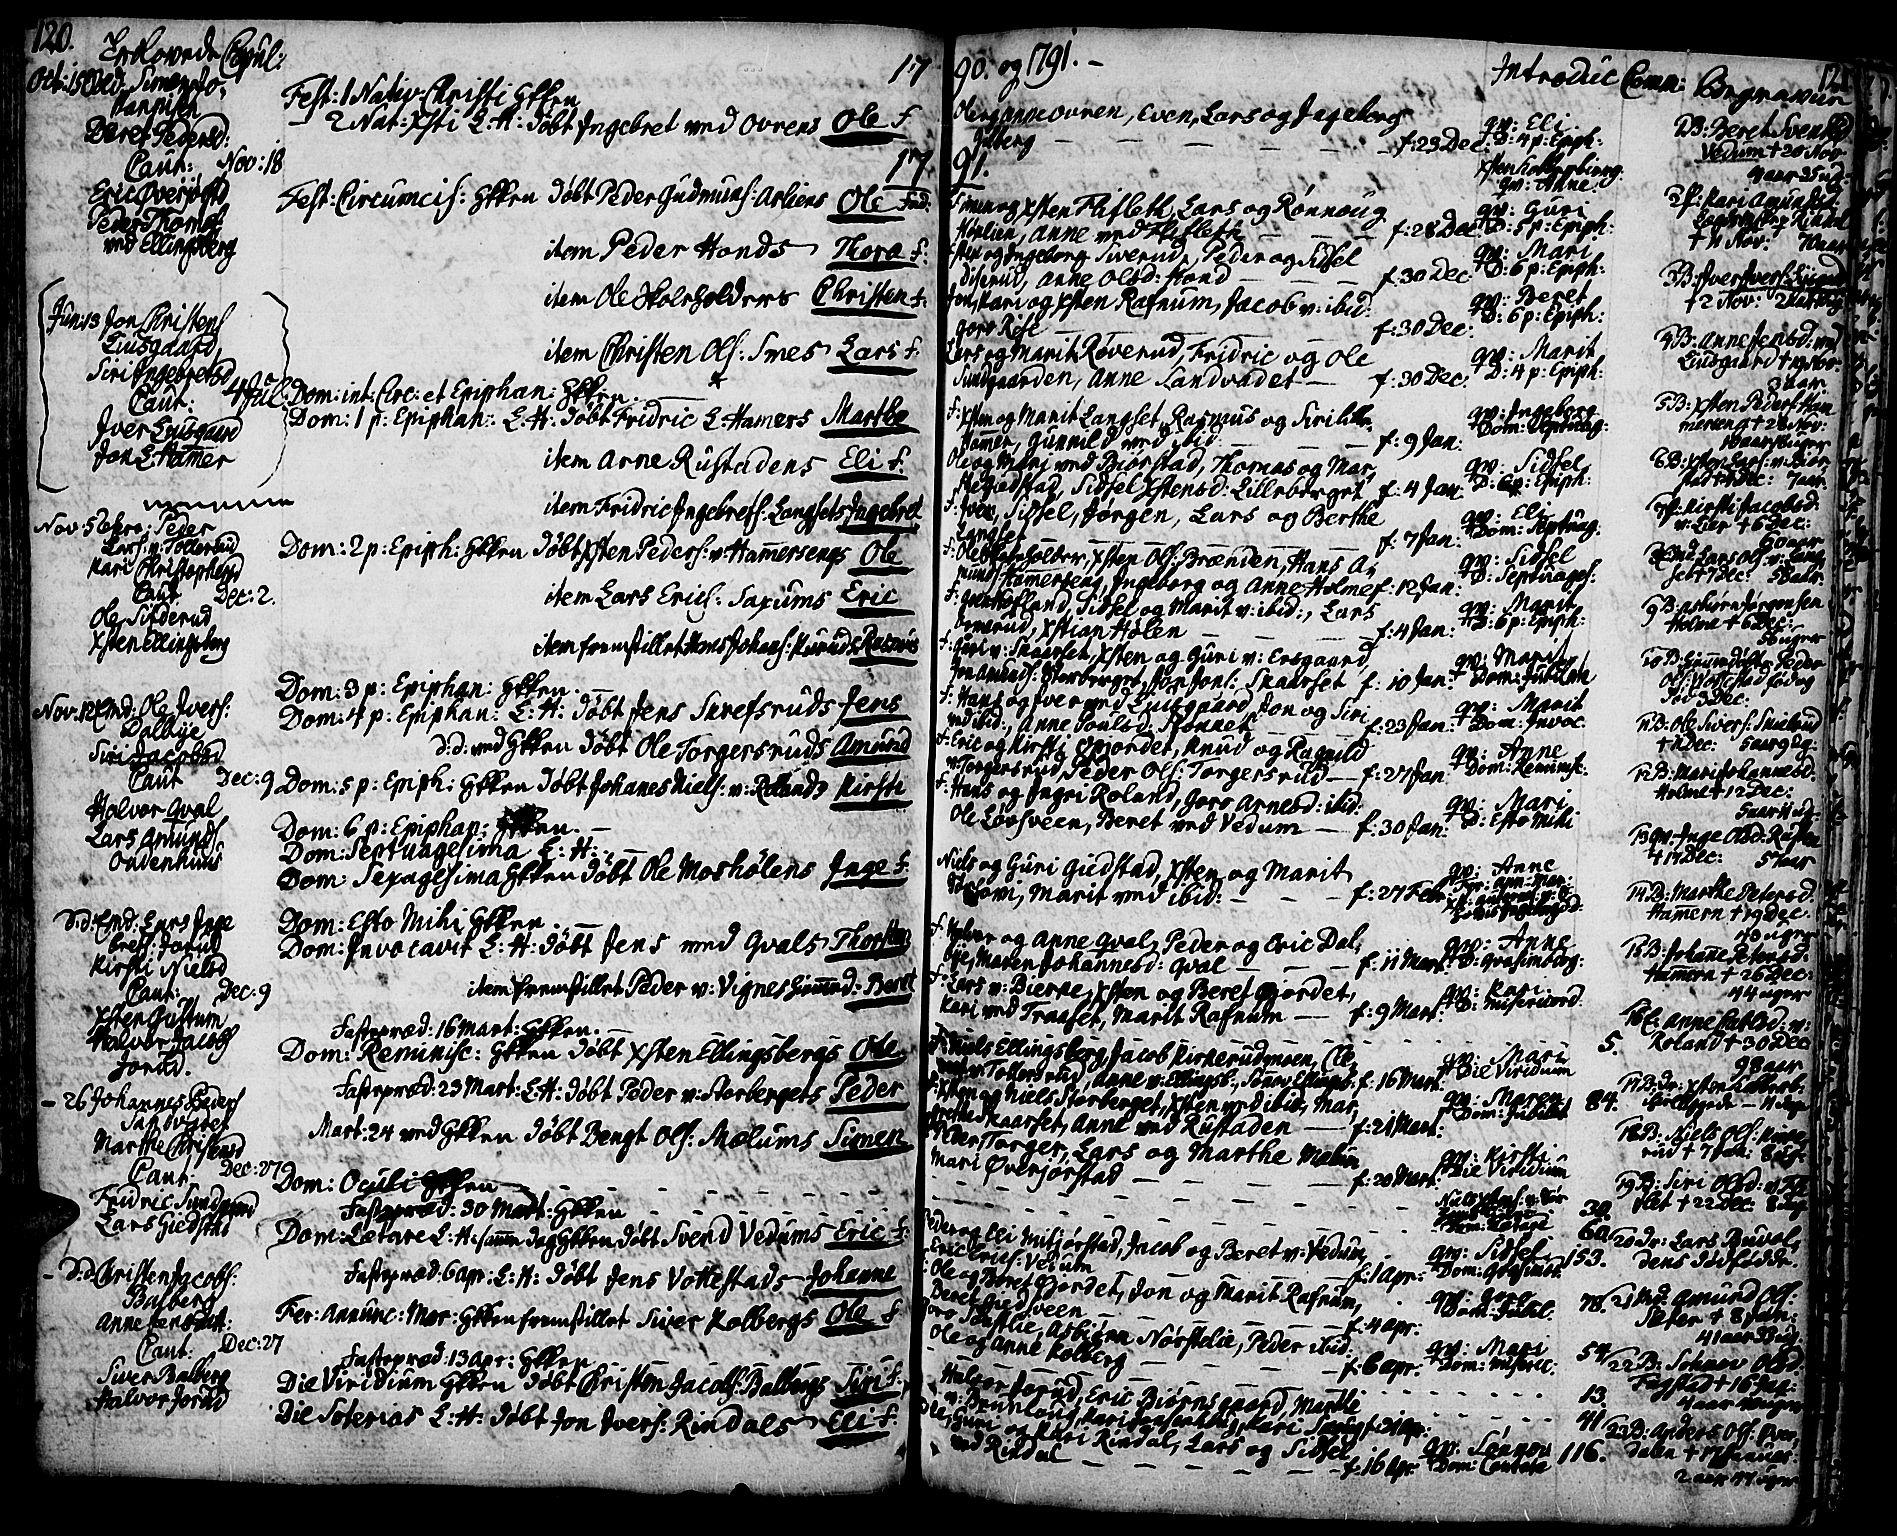 SAH, Fåberg prestekontor, Ministerialbok nr. 2, 1775-1818, s. 120-121